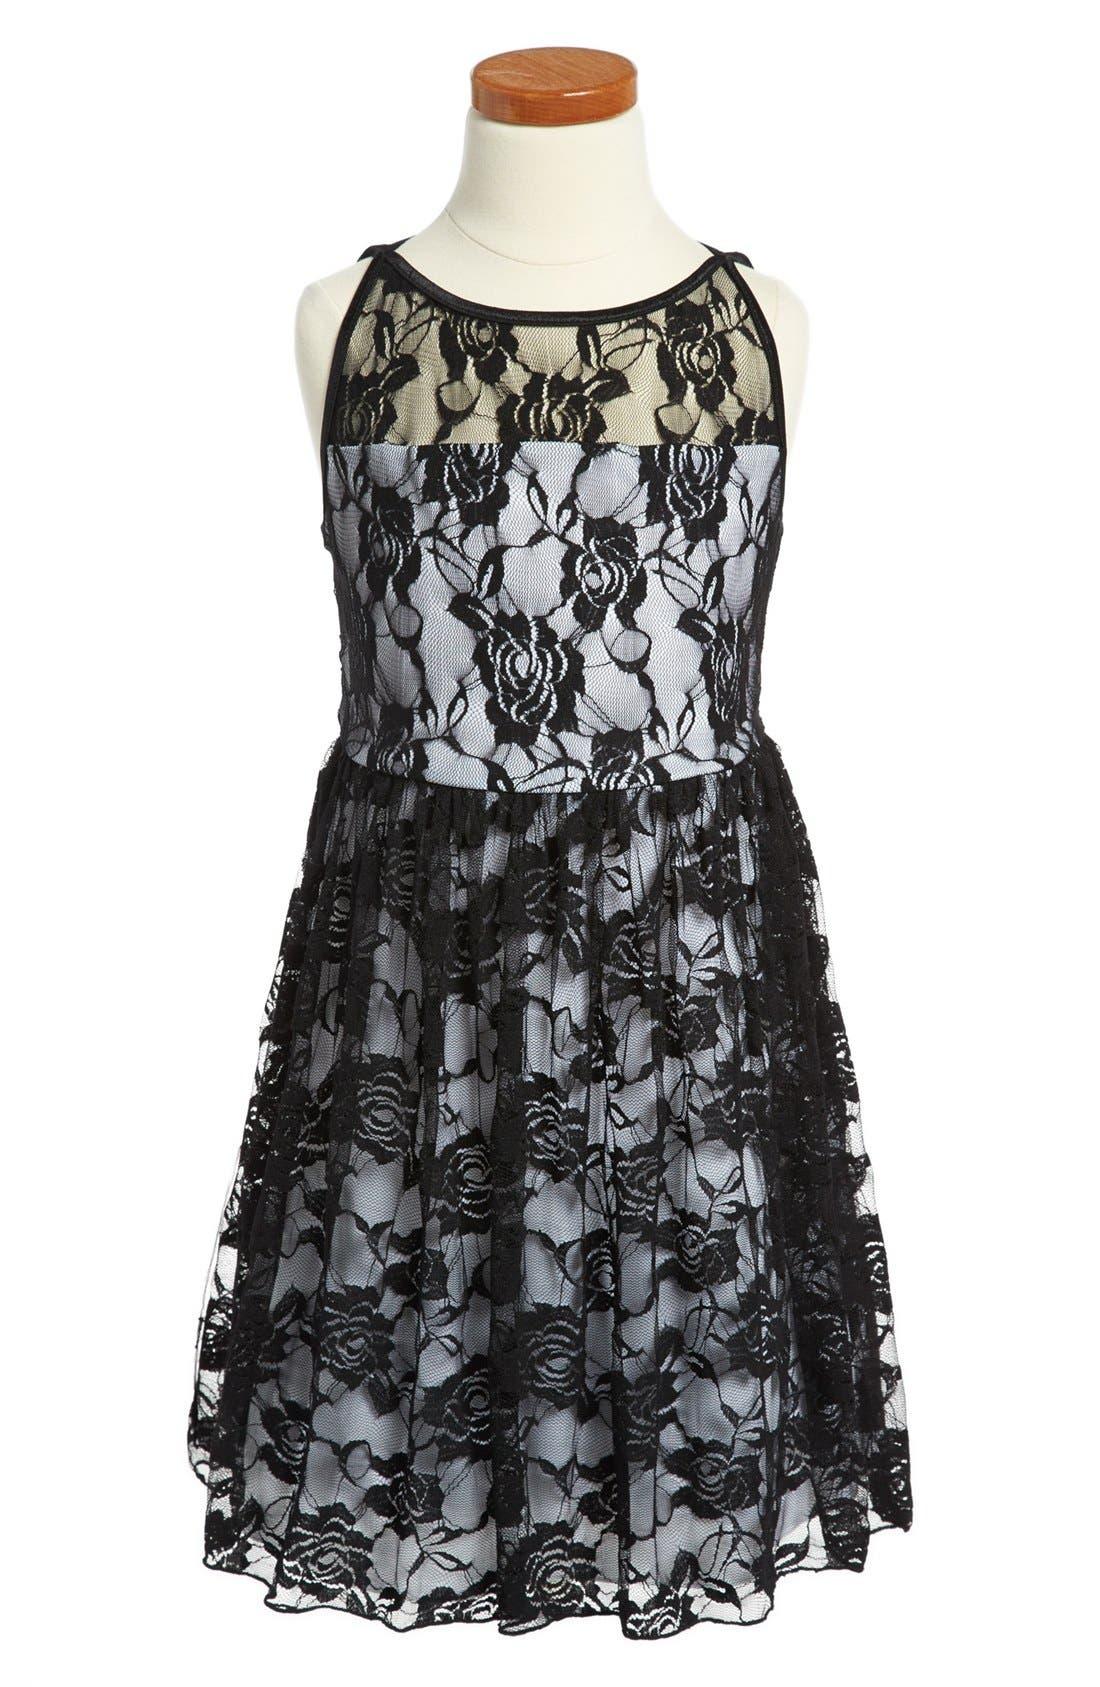 Alternate Image 1 Selected - Roxette Sleeveless Lace Dress (Big Girls)